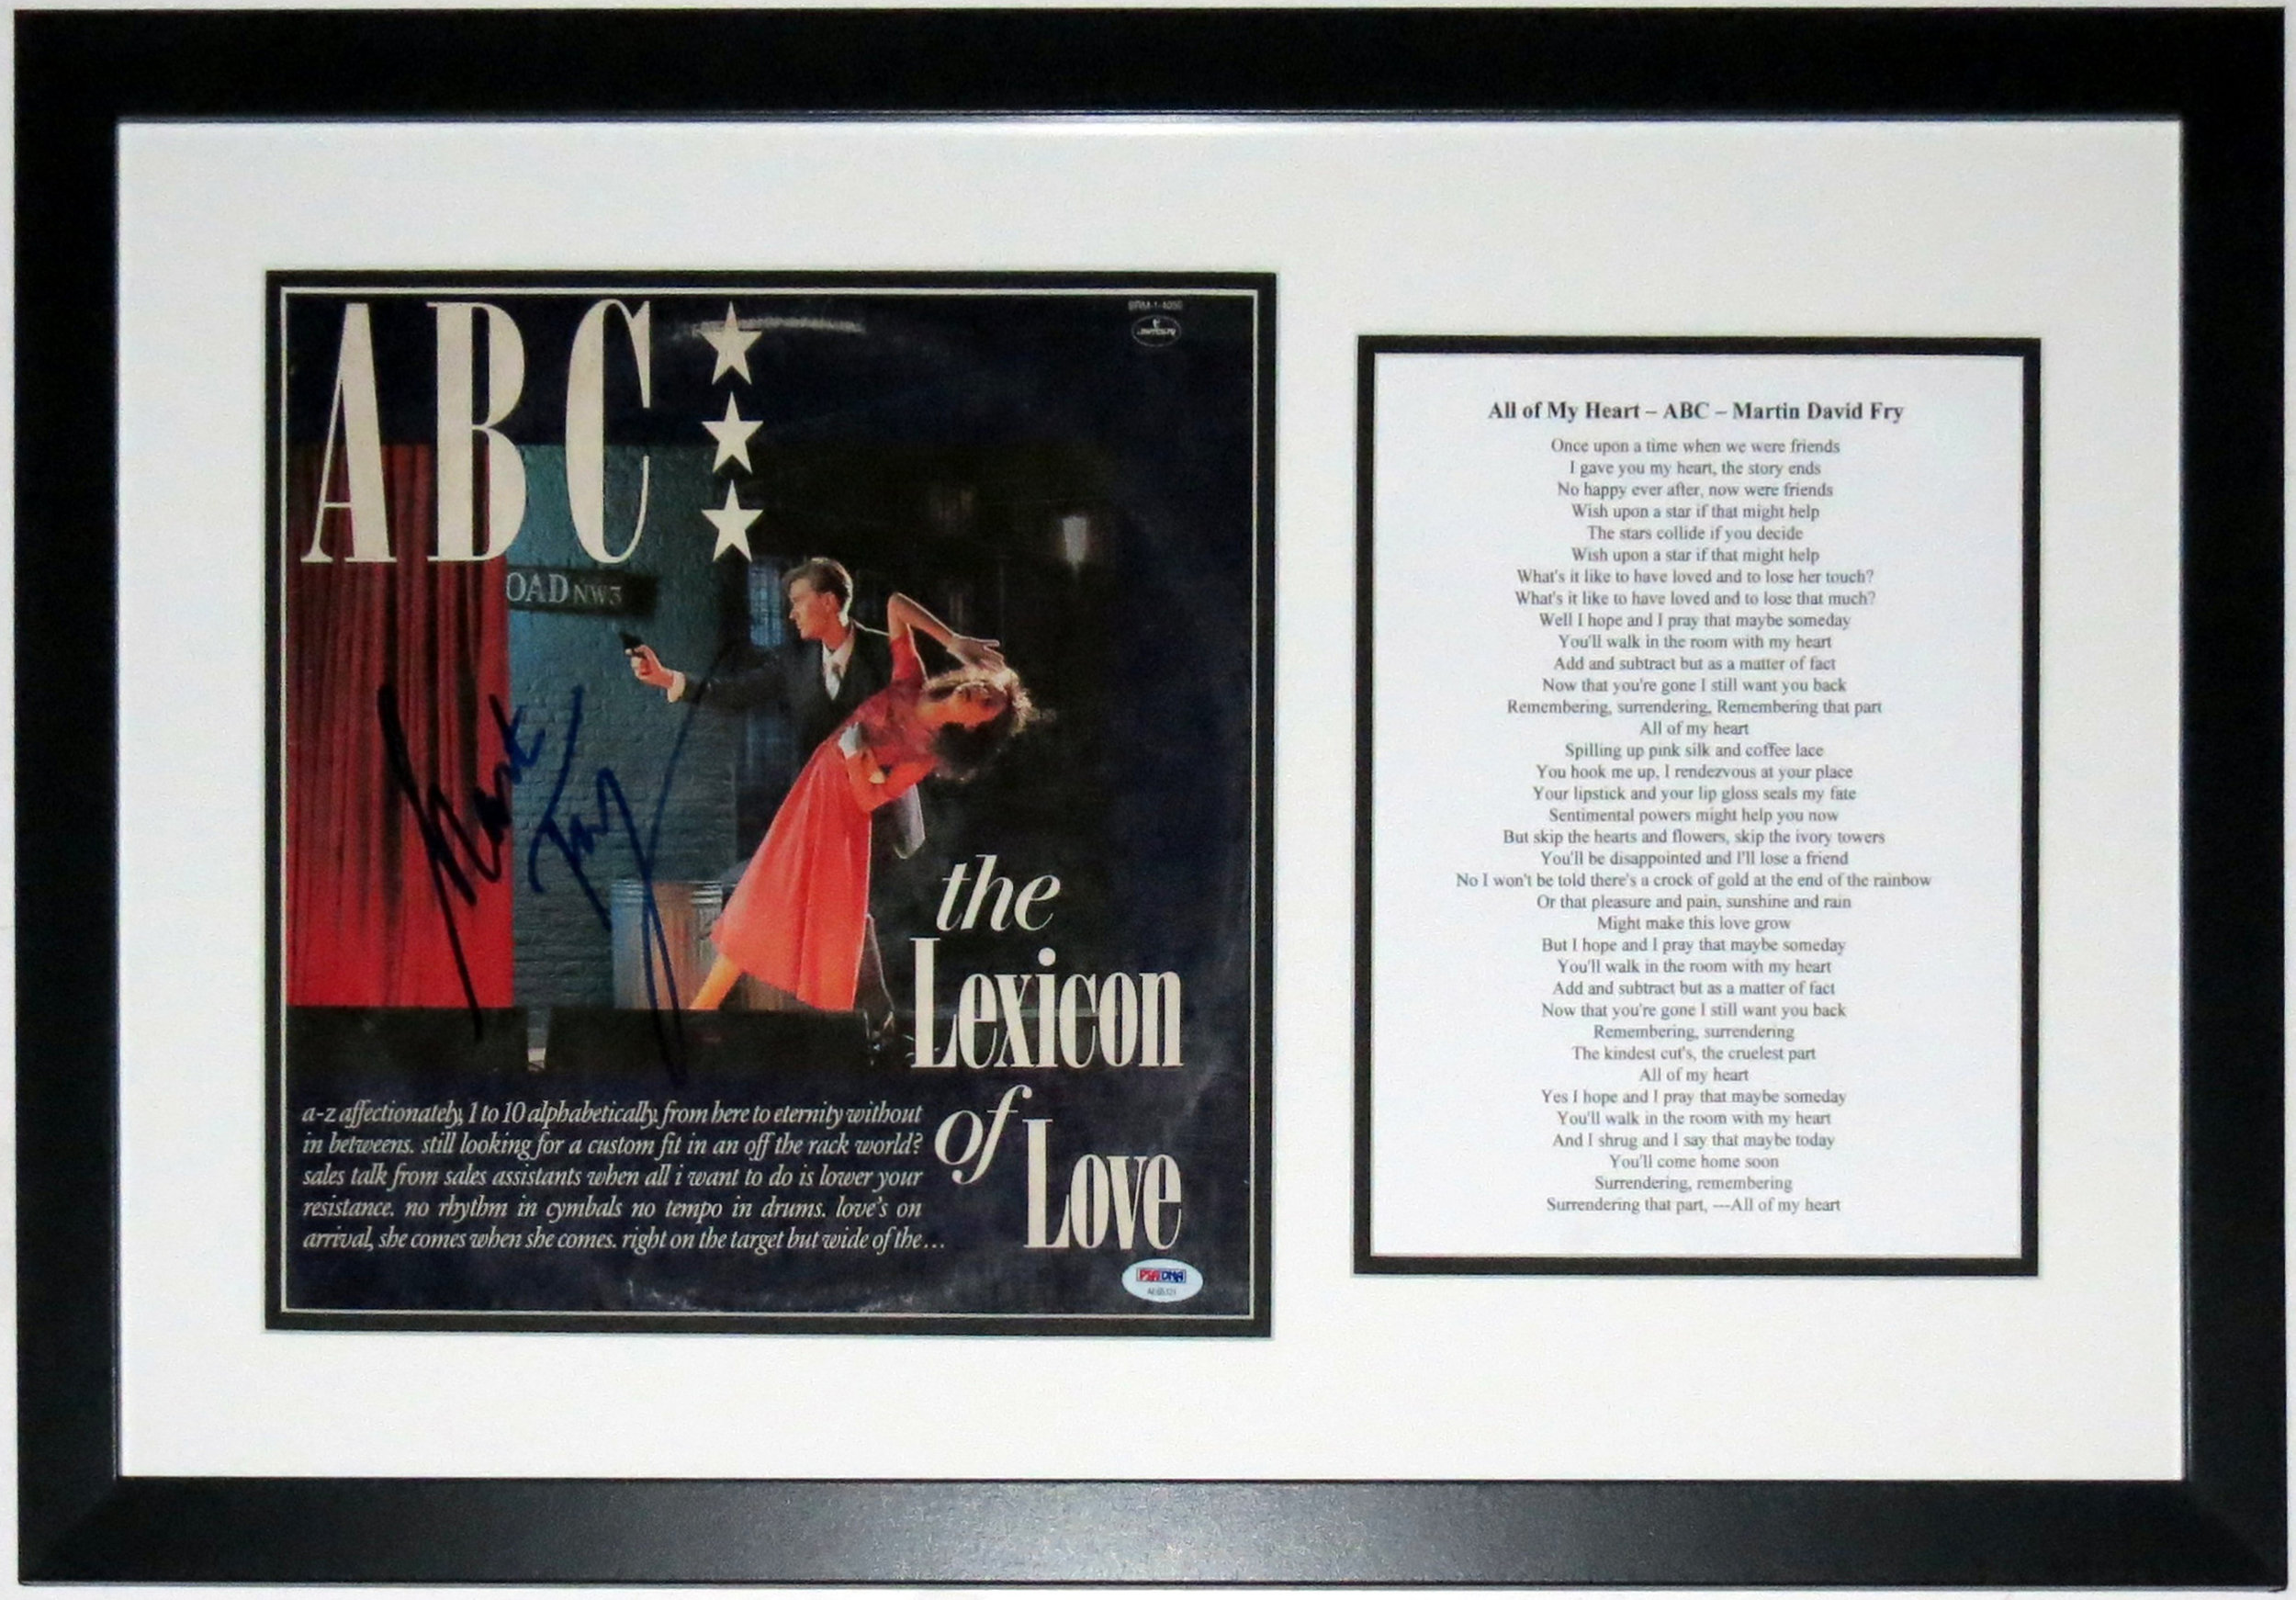 Martin Fry Signed ABC The Lexicon of Love Album - PSA DNA COA Authenticated - Professionally Framed & Lyrics